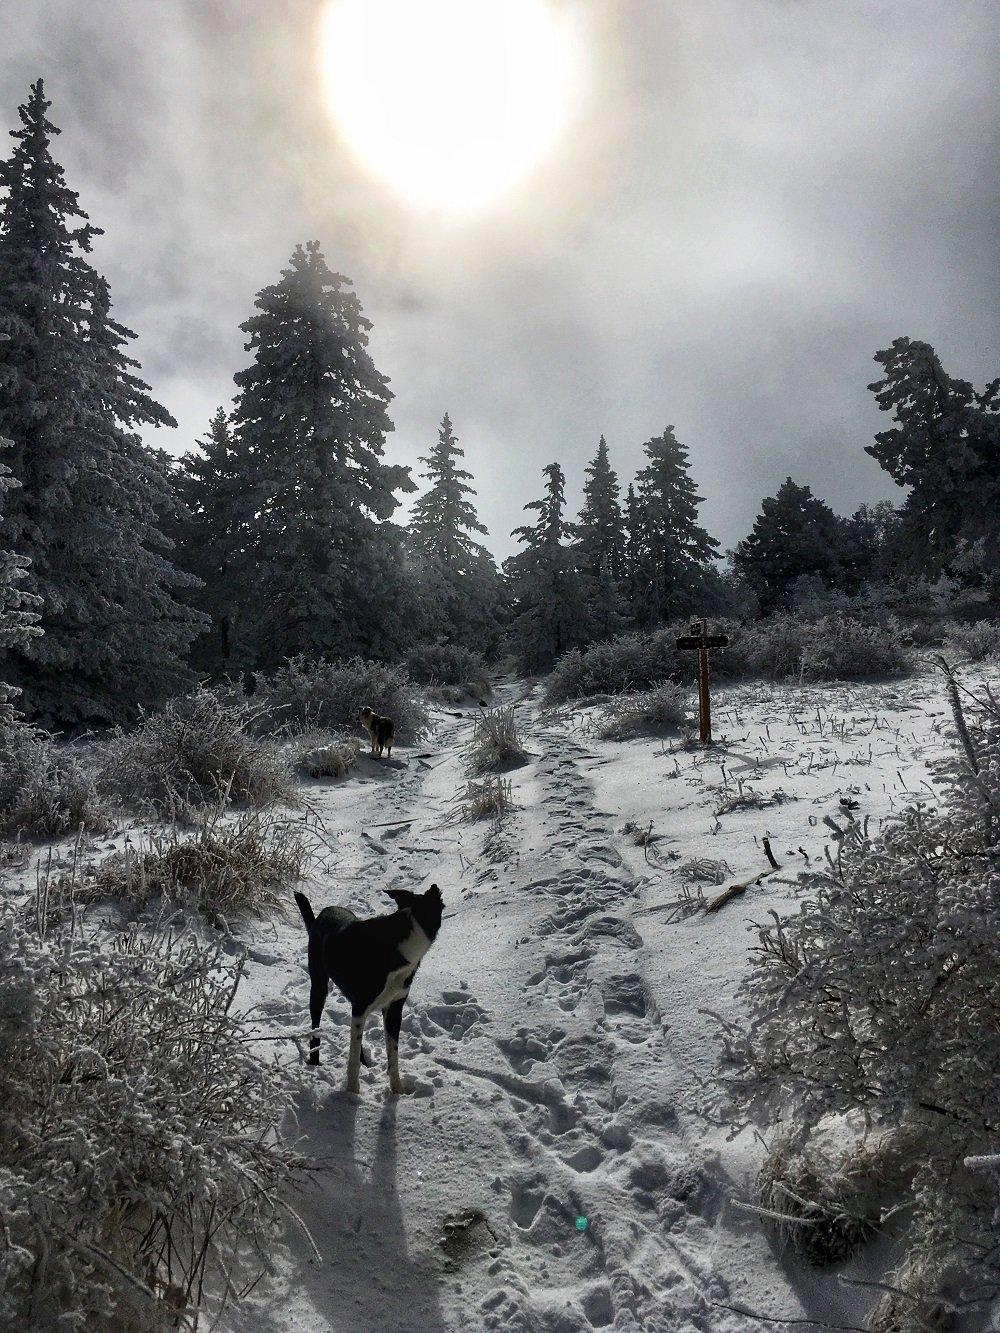 5. Ellis Trail